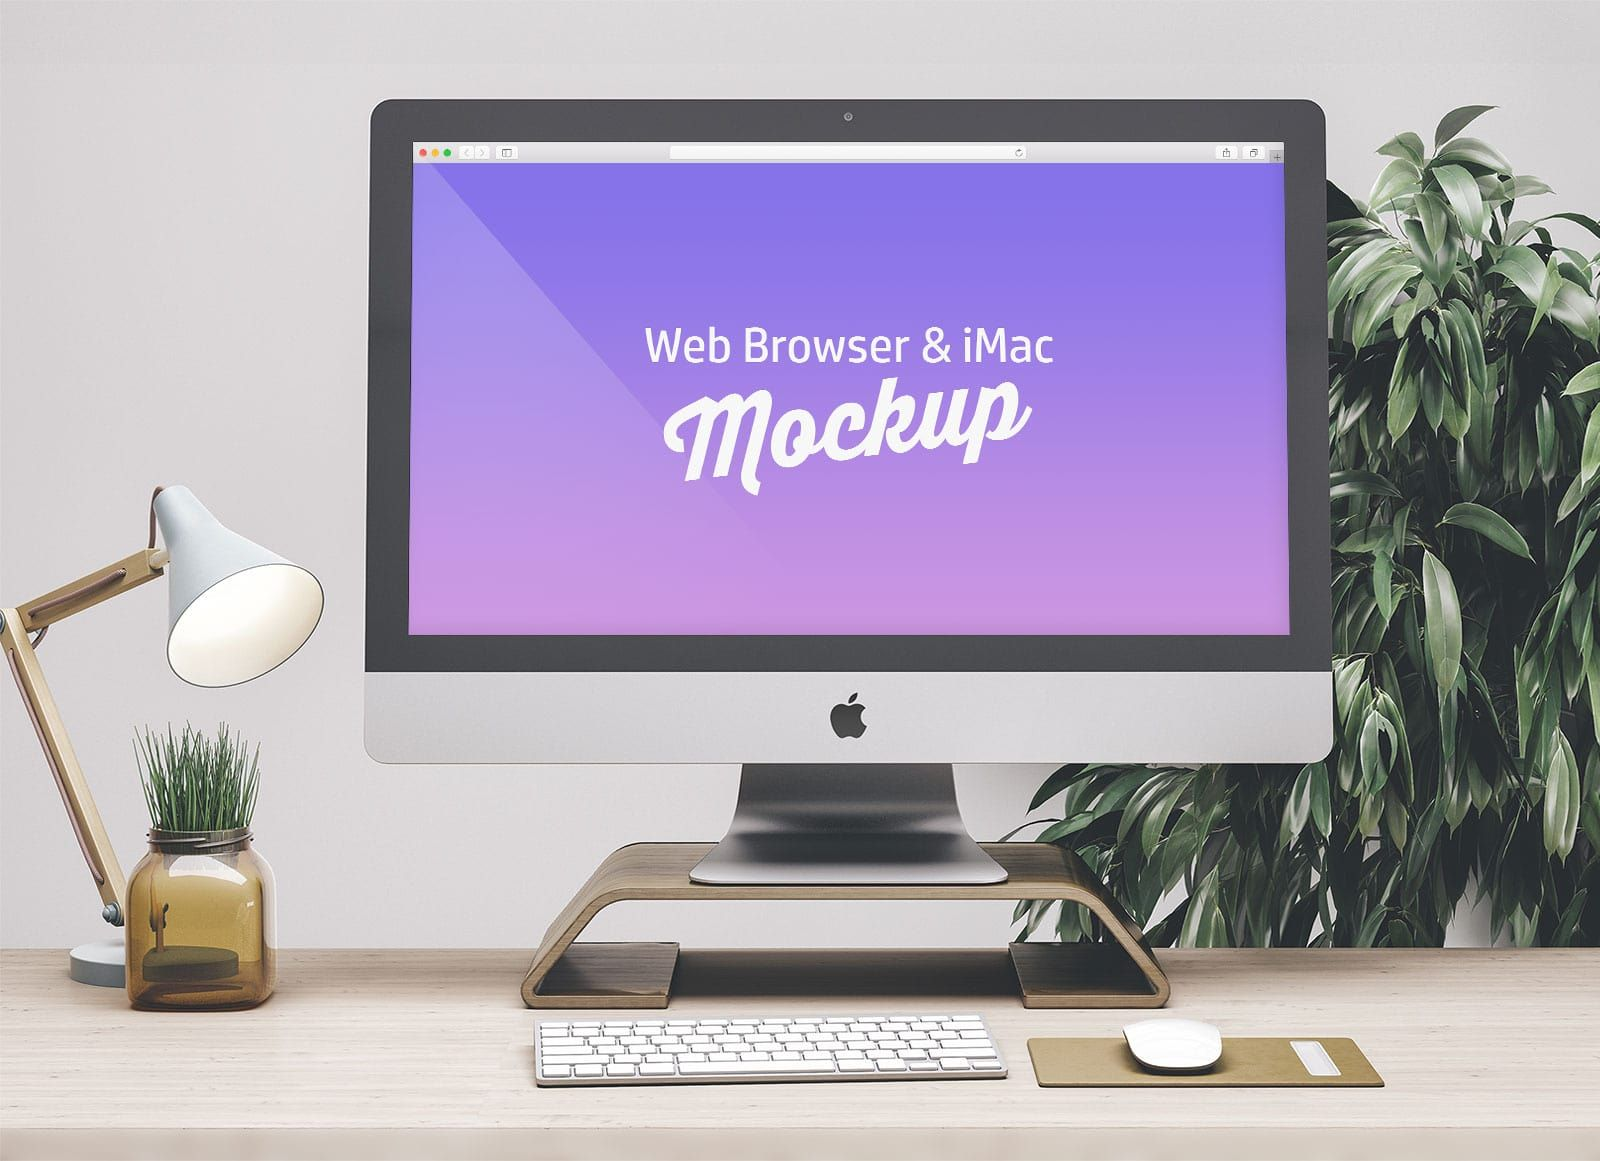 Free Web Browser Imac Mockup Psd Computer Mockup Imac Mockup Design